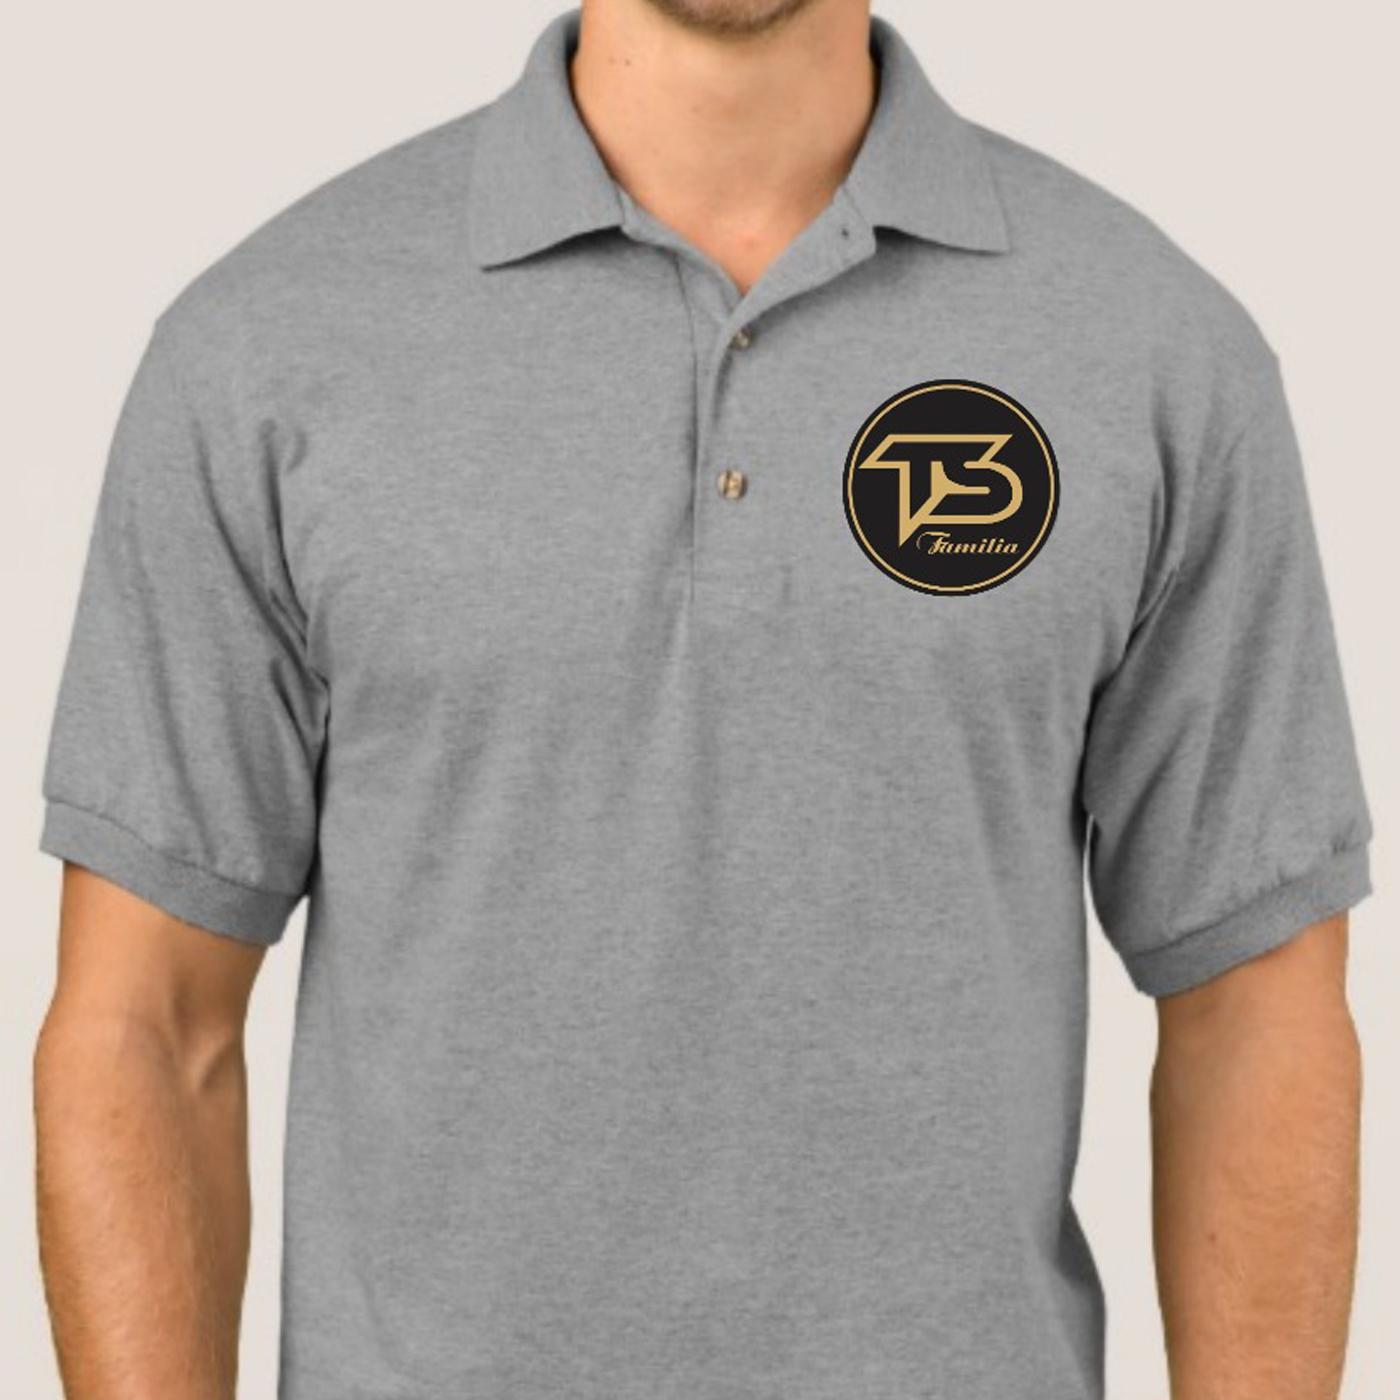 Poloshirt TS Familia, Poloshirt Lacoste Cotton